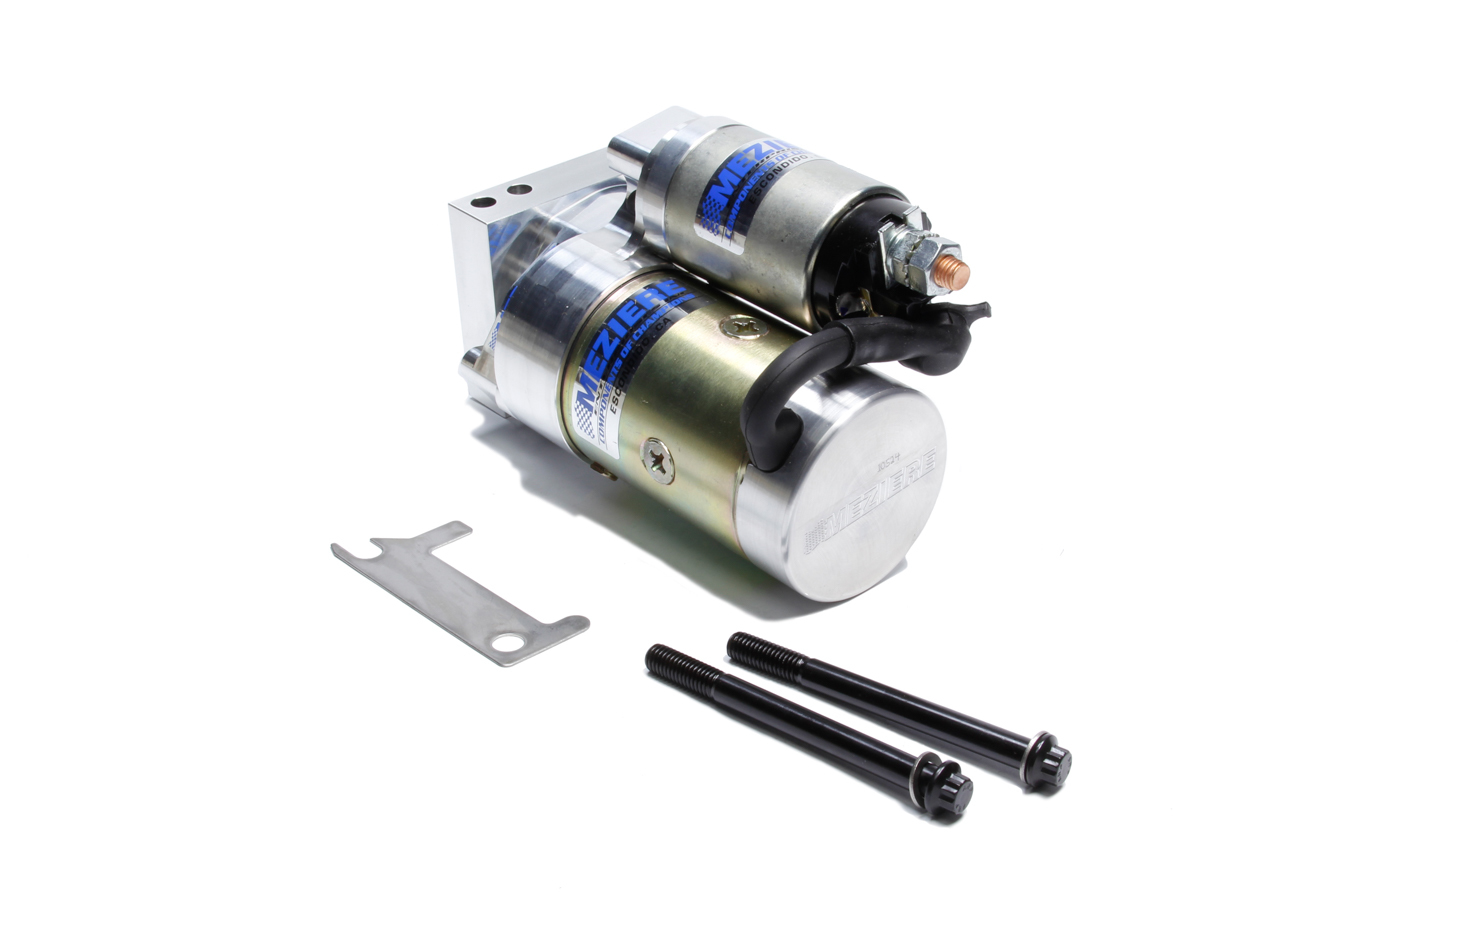 Meziere TS400DP Starter, 400 Series True Start, Gear Reduction, Adjustable Block, 168/153 Tooth Flywheel, Chevy V8, Each